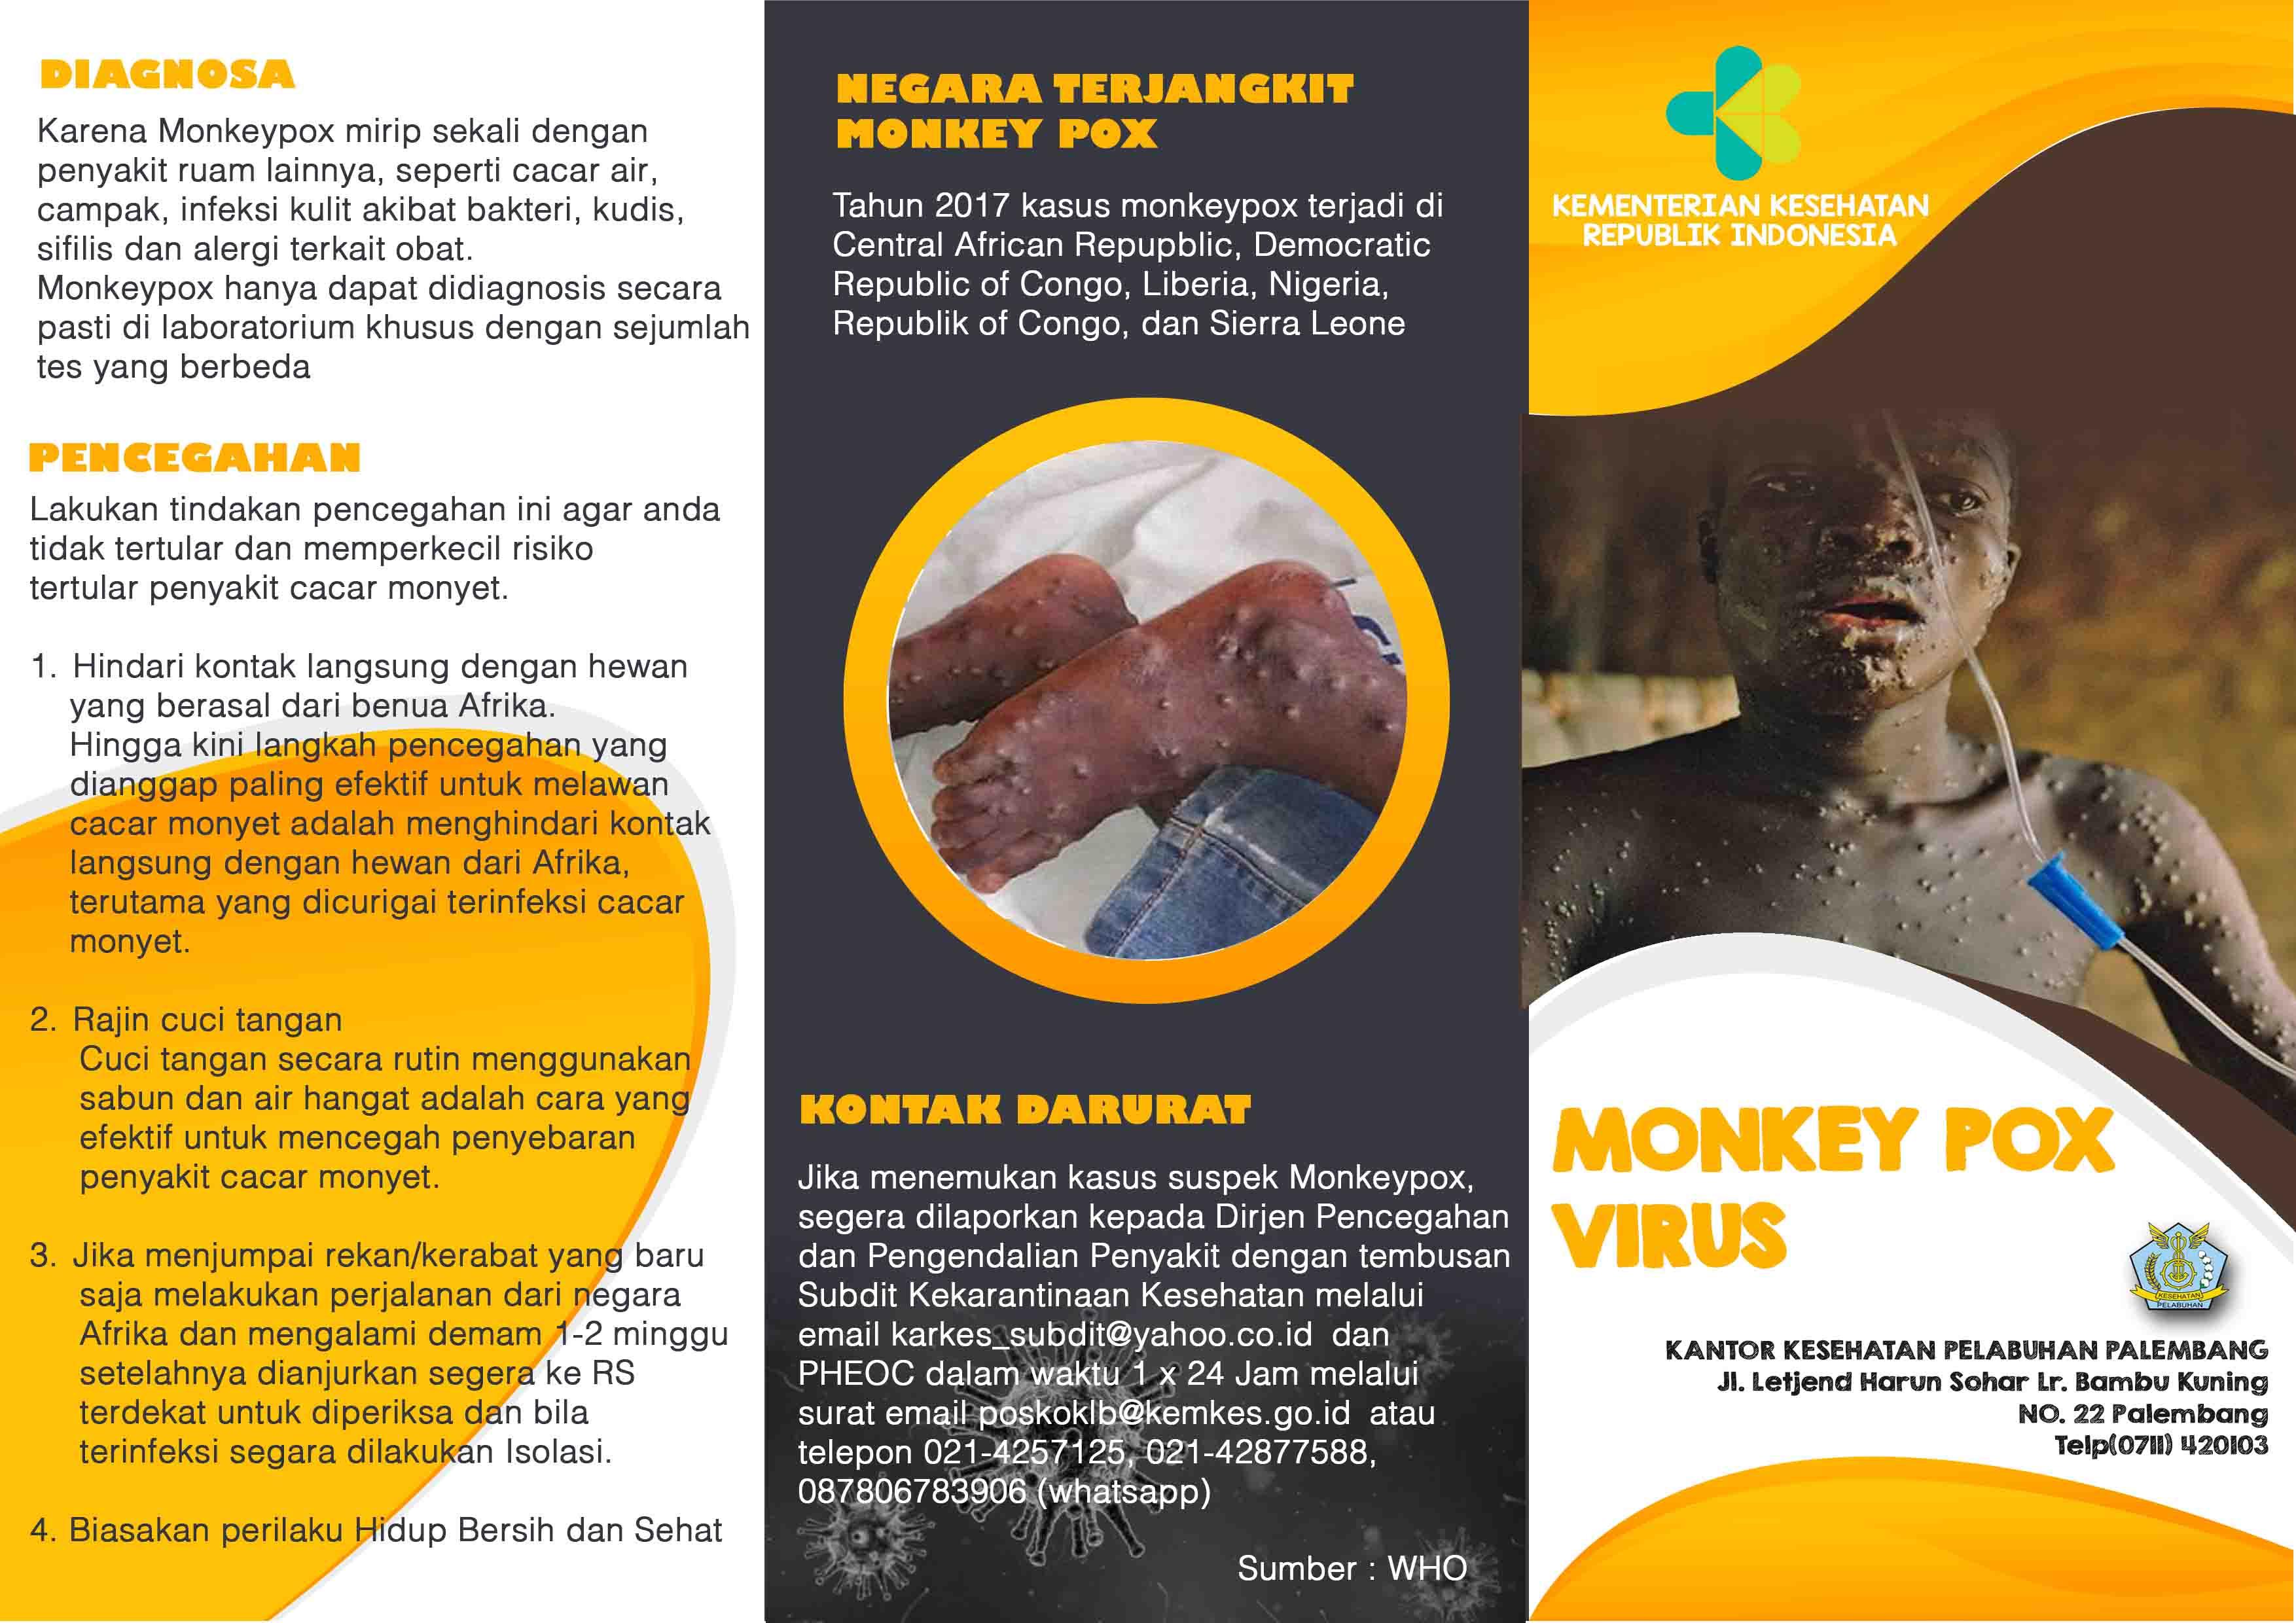 Kewaspadaan Importasi Penyakit Monkeypox